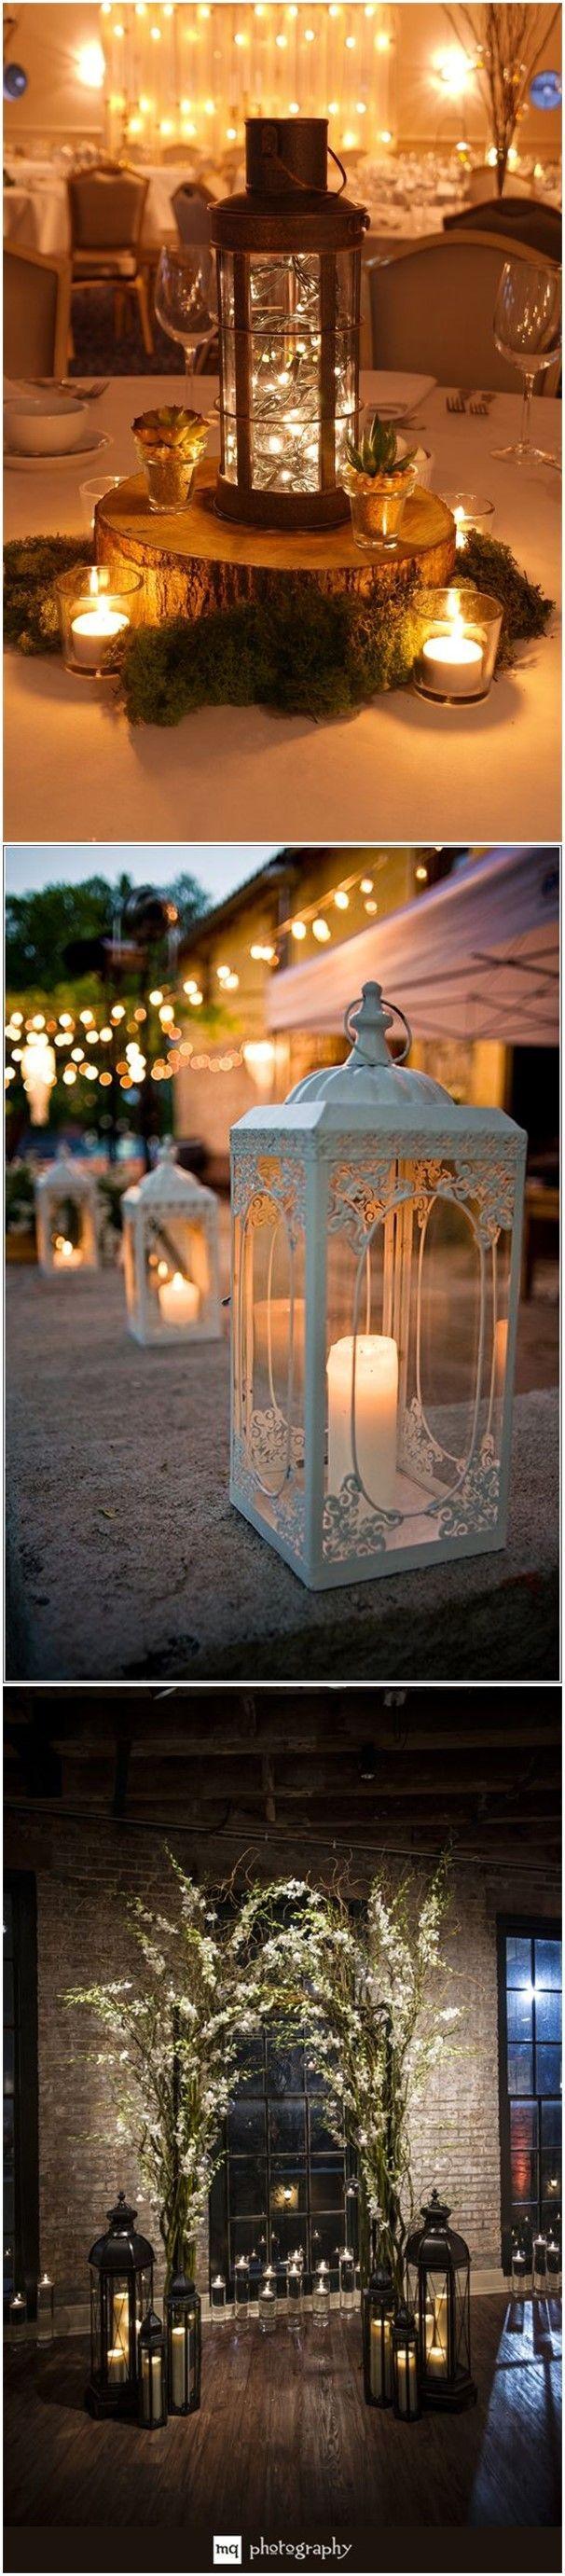 Wedding ideas with lanterns   Intriguing Rustic Wedding Lantern Ideas You Will Heart